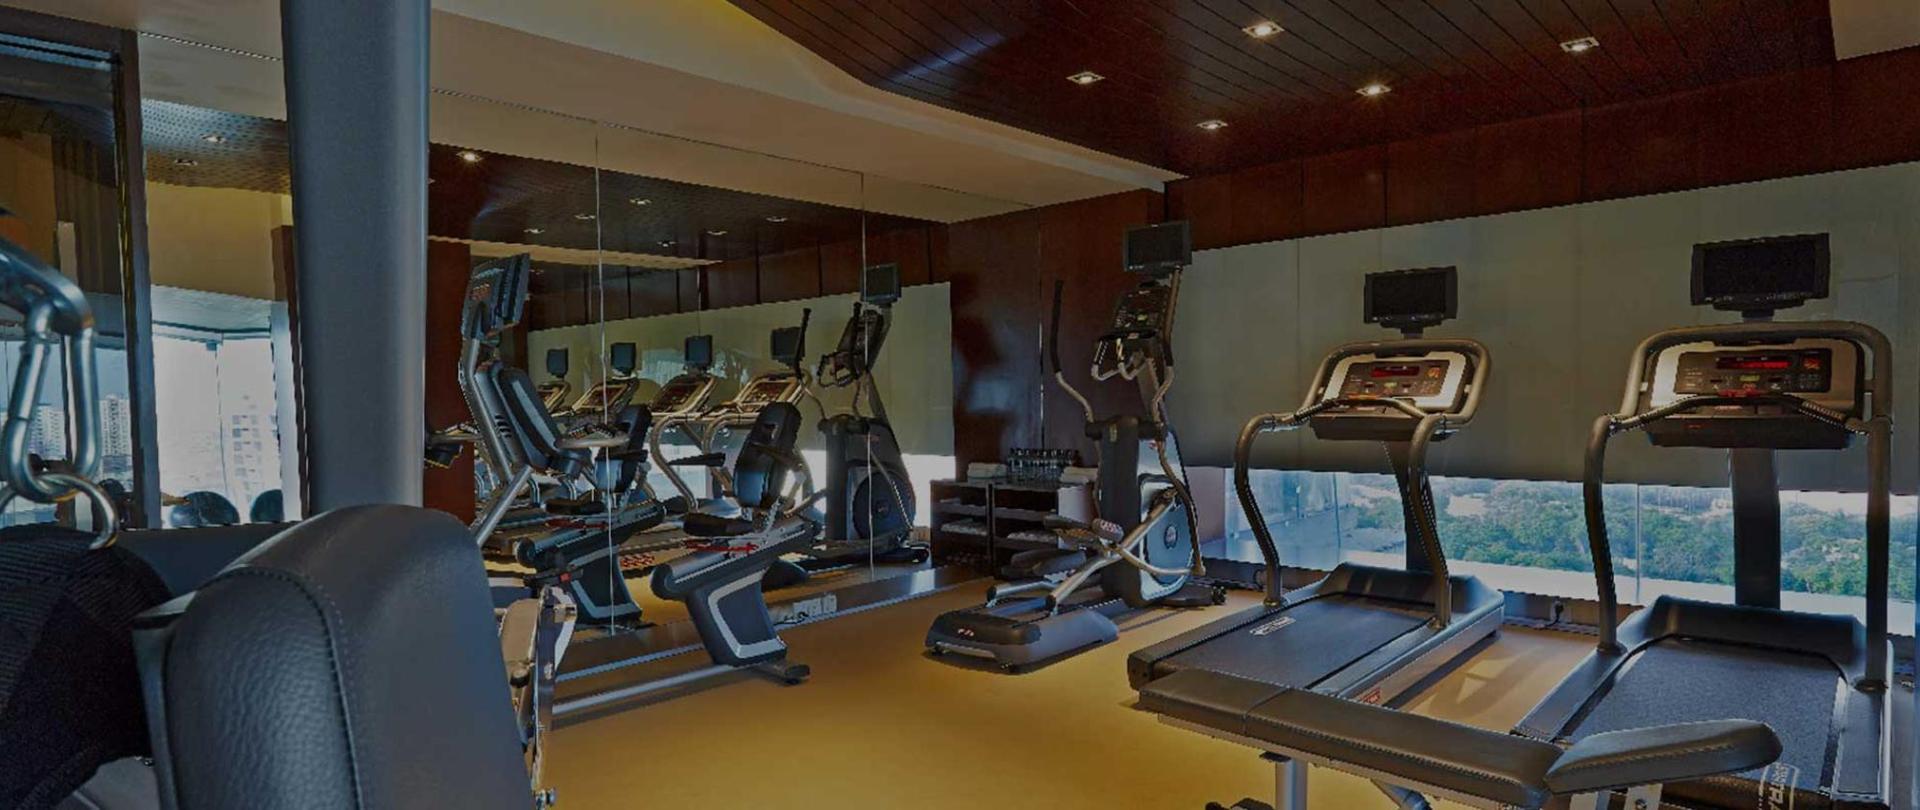 sixseasons-gym.jpg